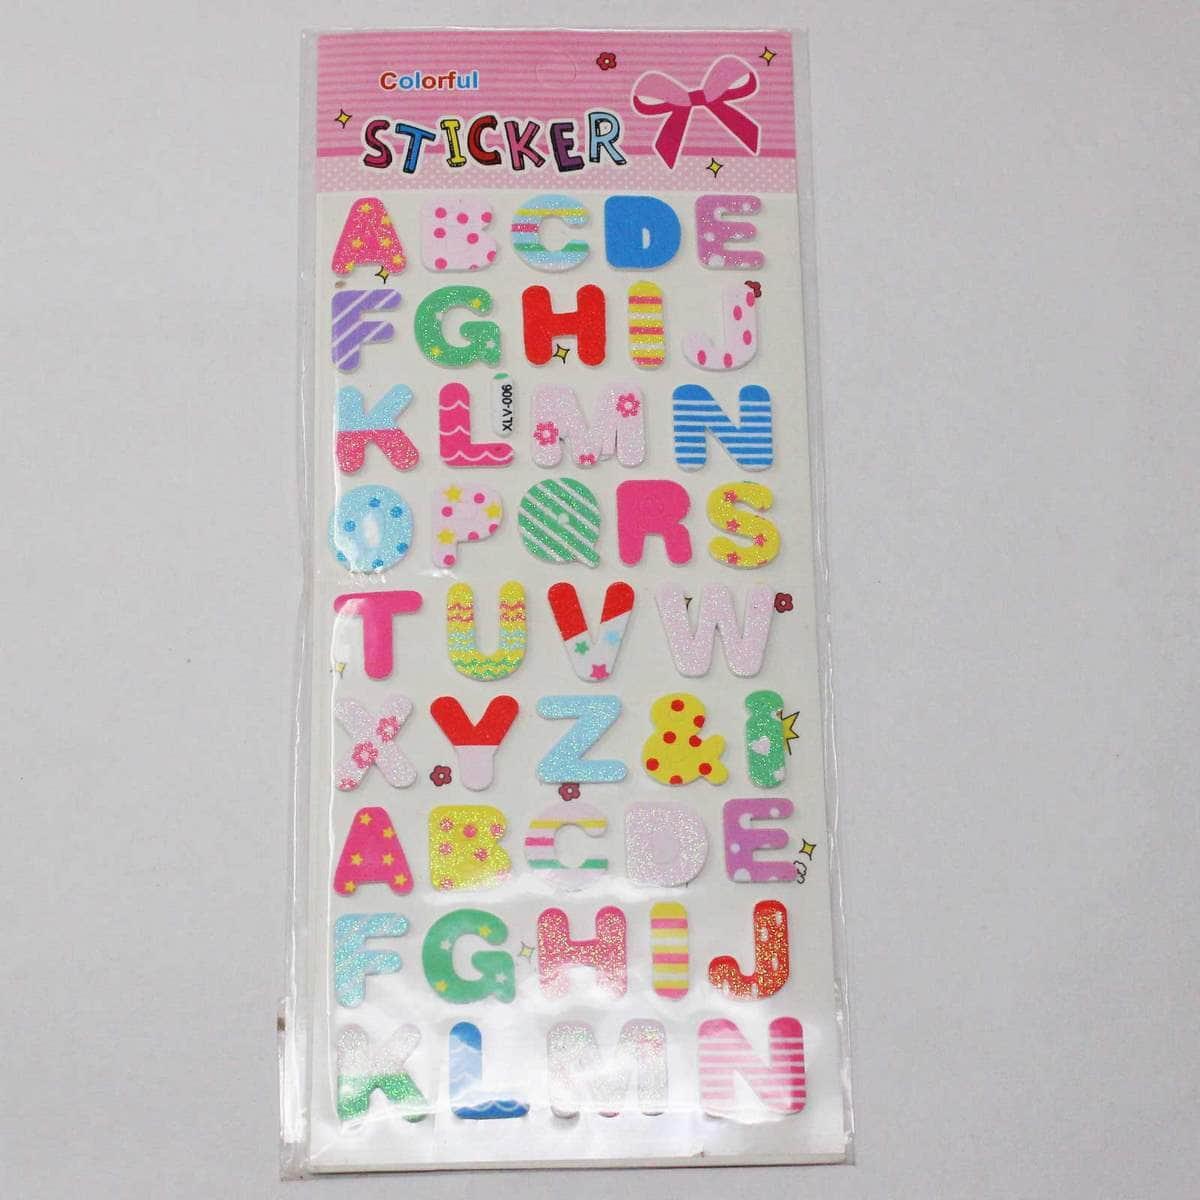 Foam Sticker With Glitter Alphabets Design